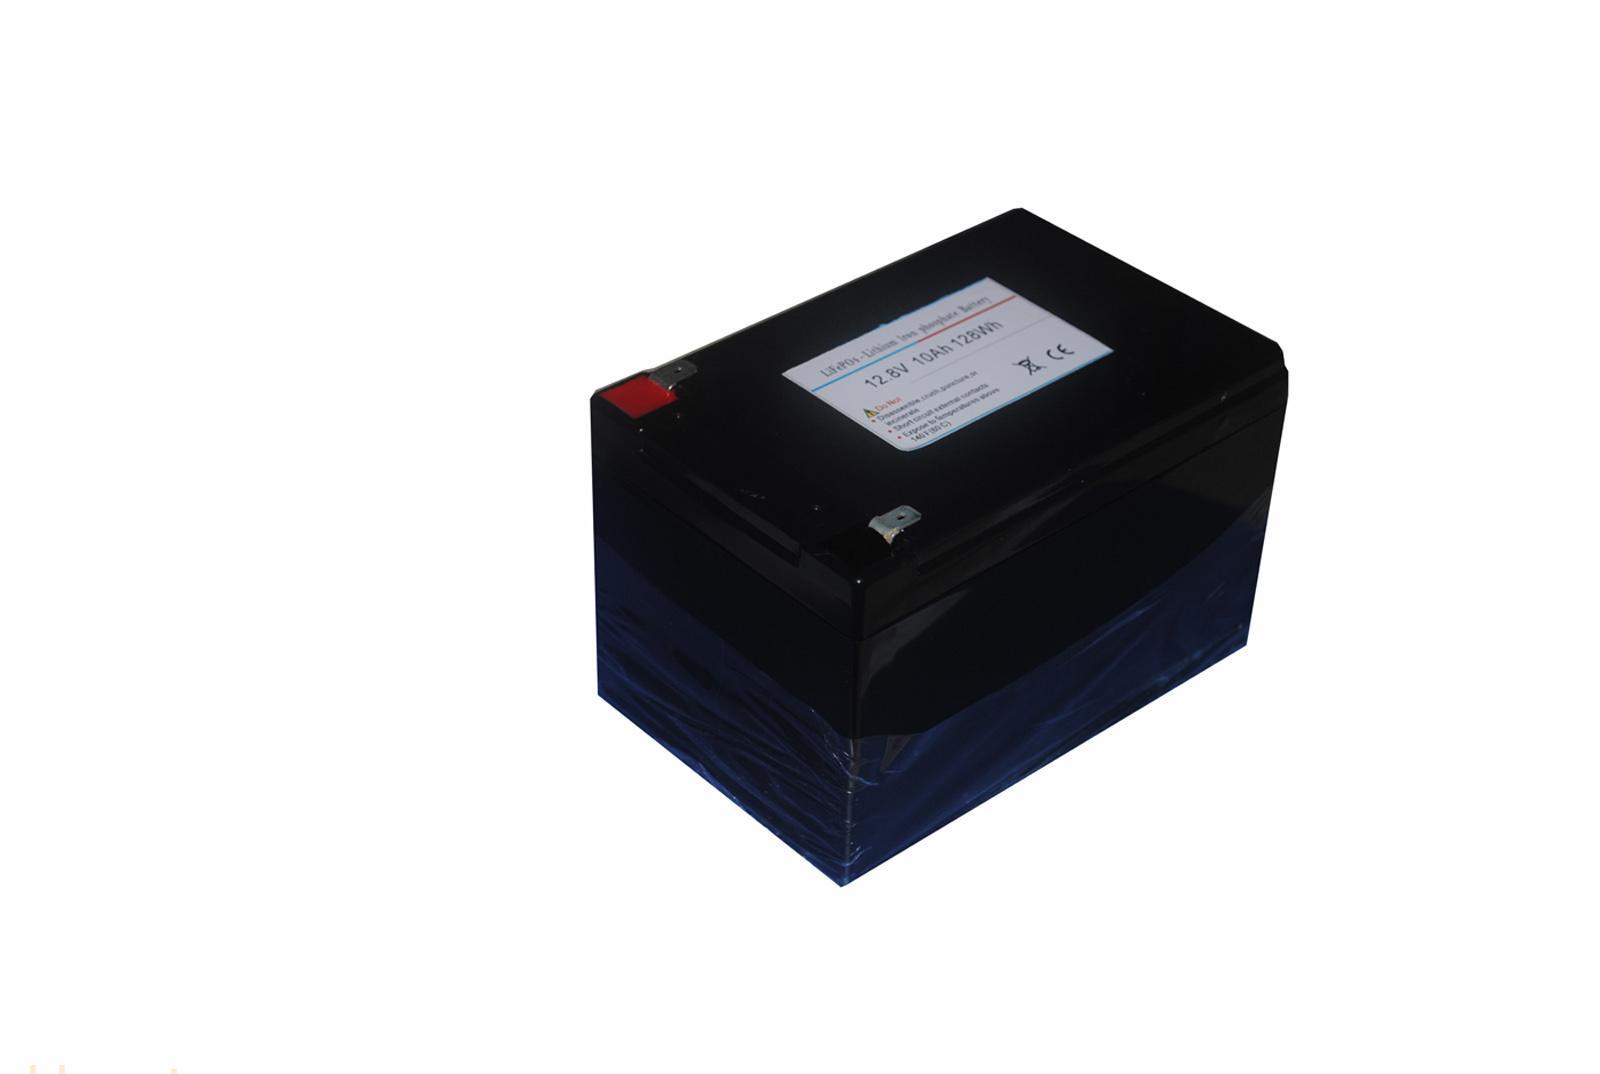 12.8V/10Ah  通讯设备锂电池